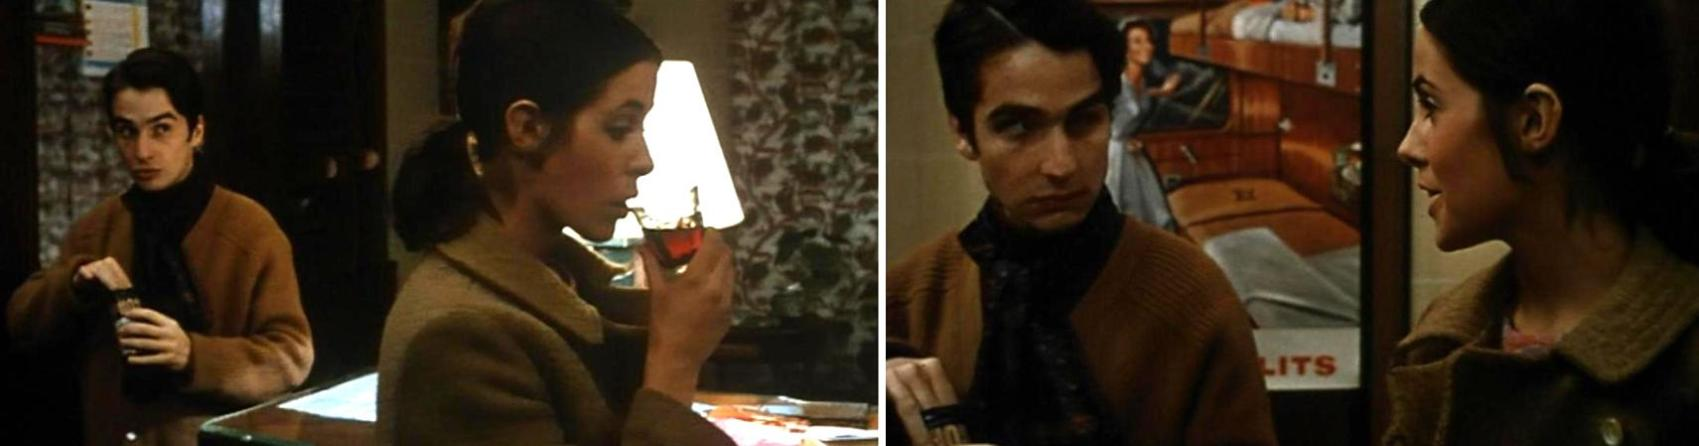 Alcina_Hotel_Baisers_voles_Paris_Claude_Jade_Jean-Pierre_Leaud_Francois_Truffaut